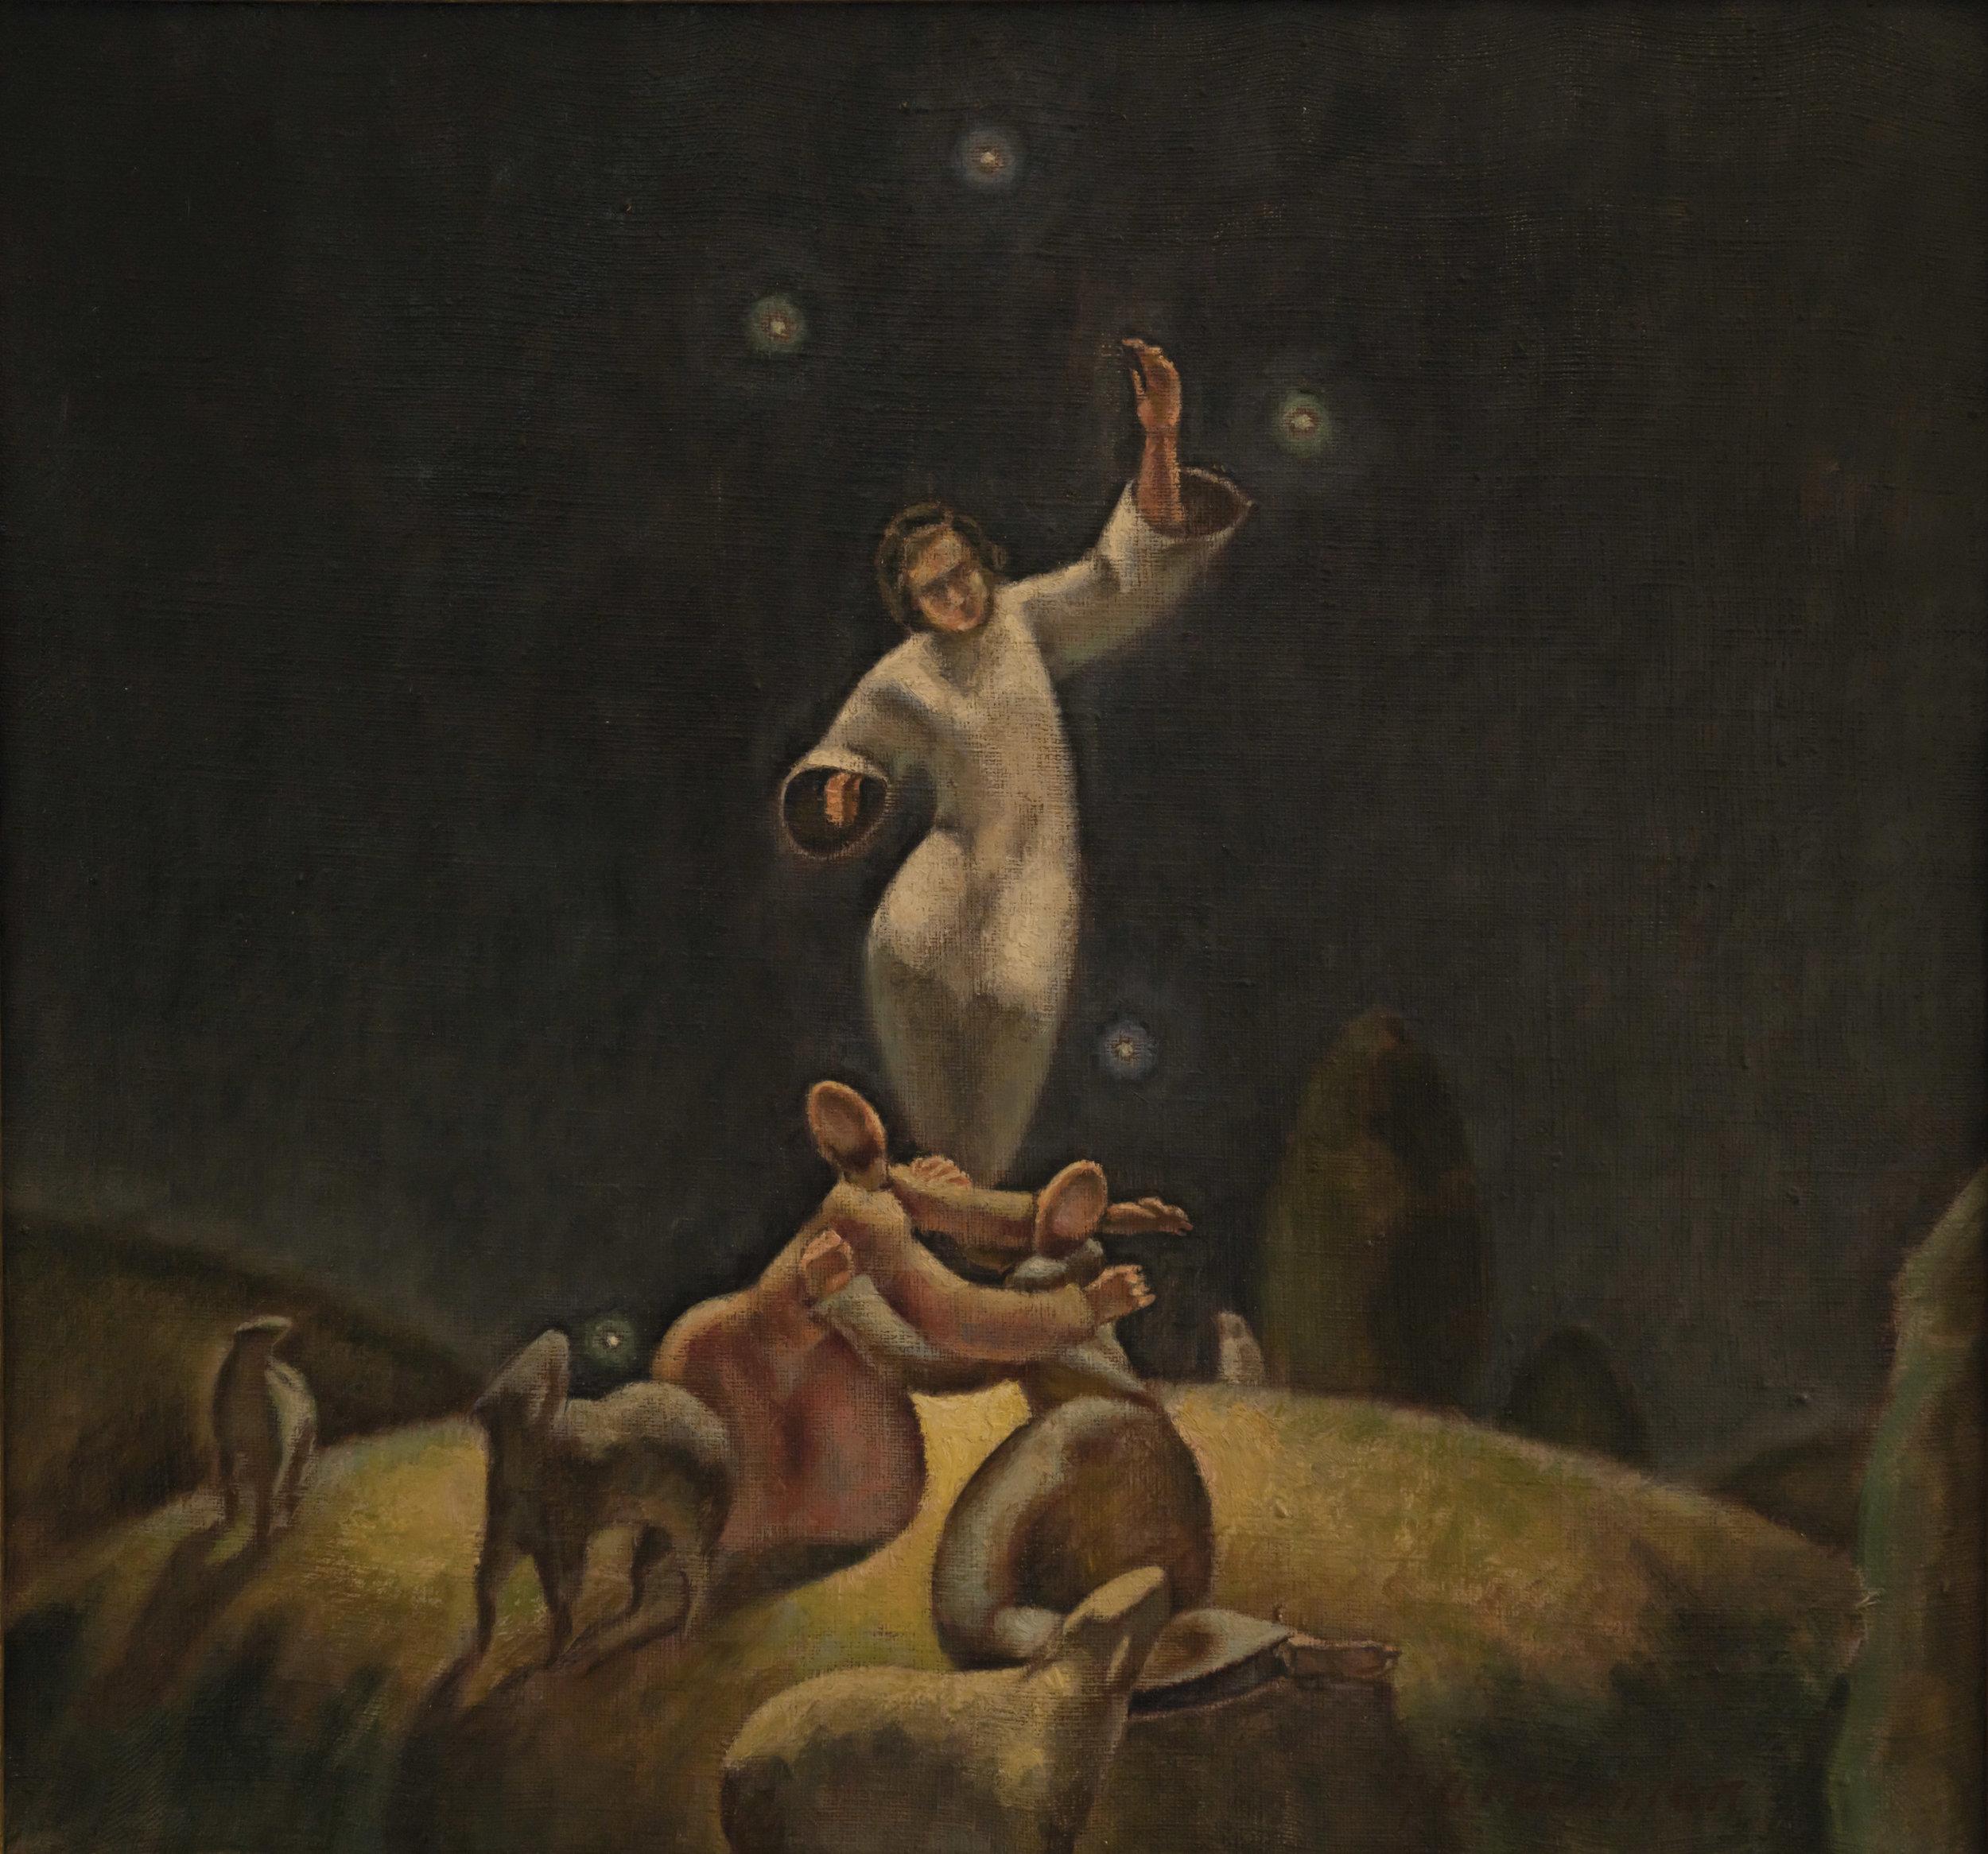 Yardumian-Annunciation-shephards.jpg